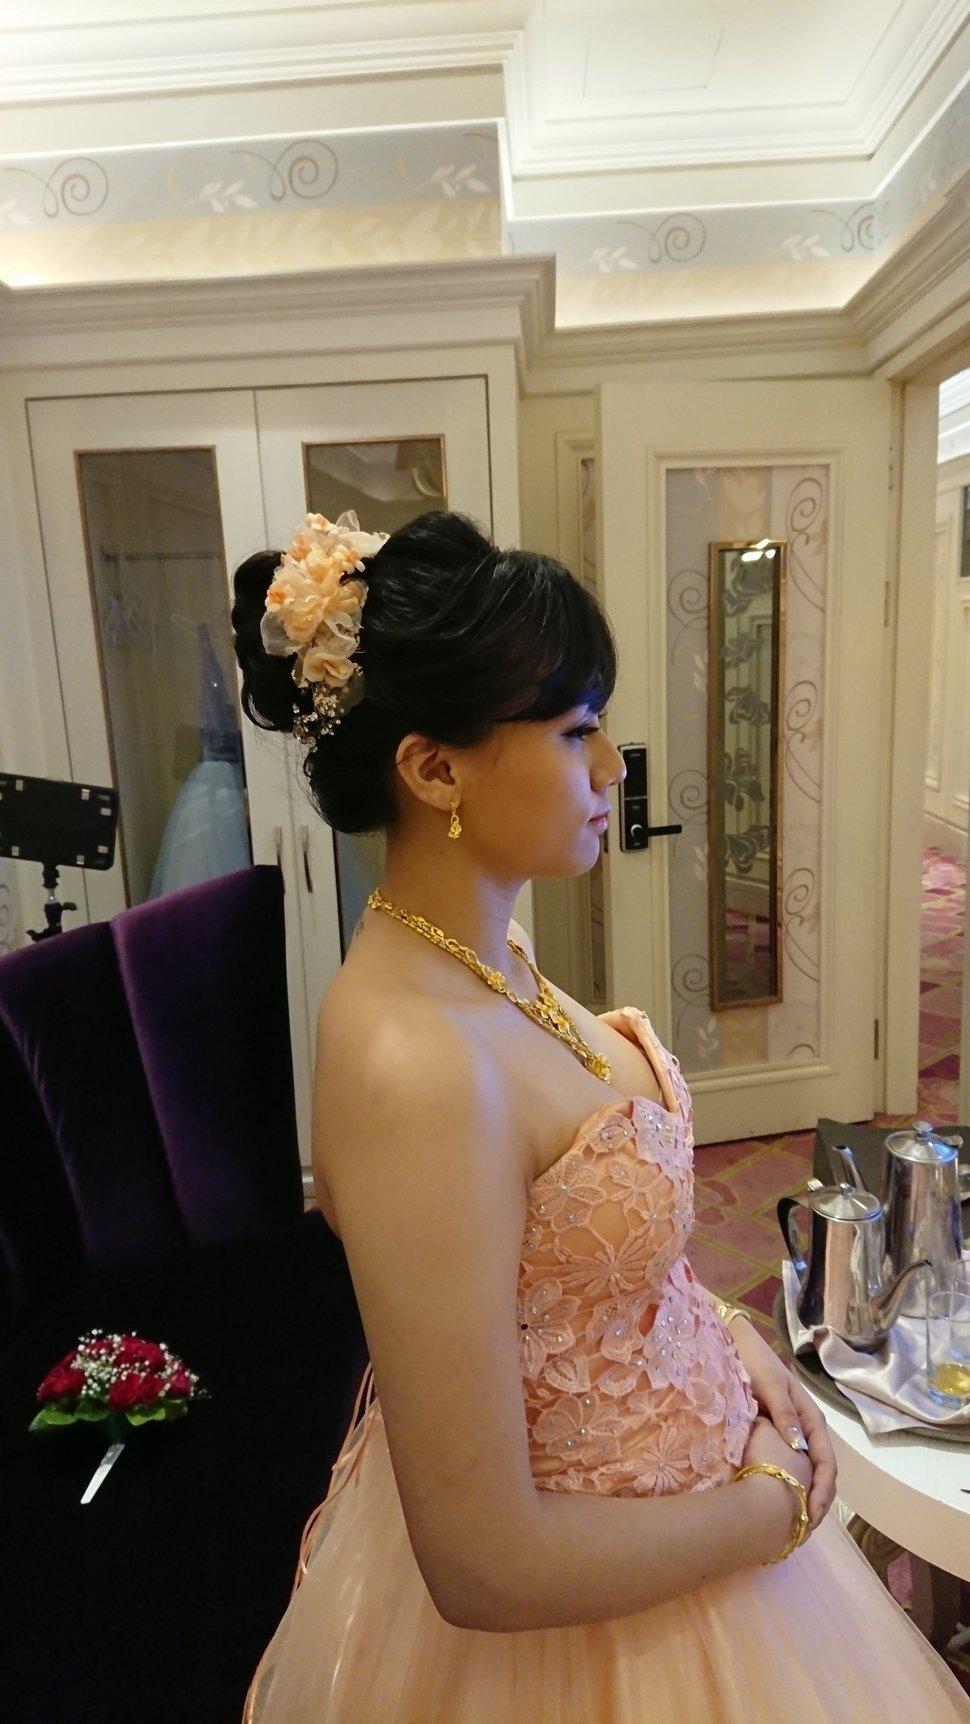 DSC_0084 - 花精靈婚紗∣攝影∣新秘 - 結婚吧